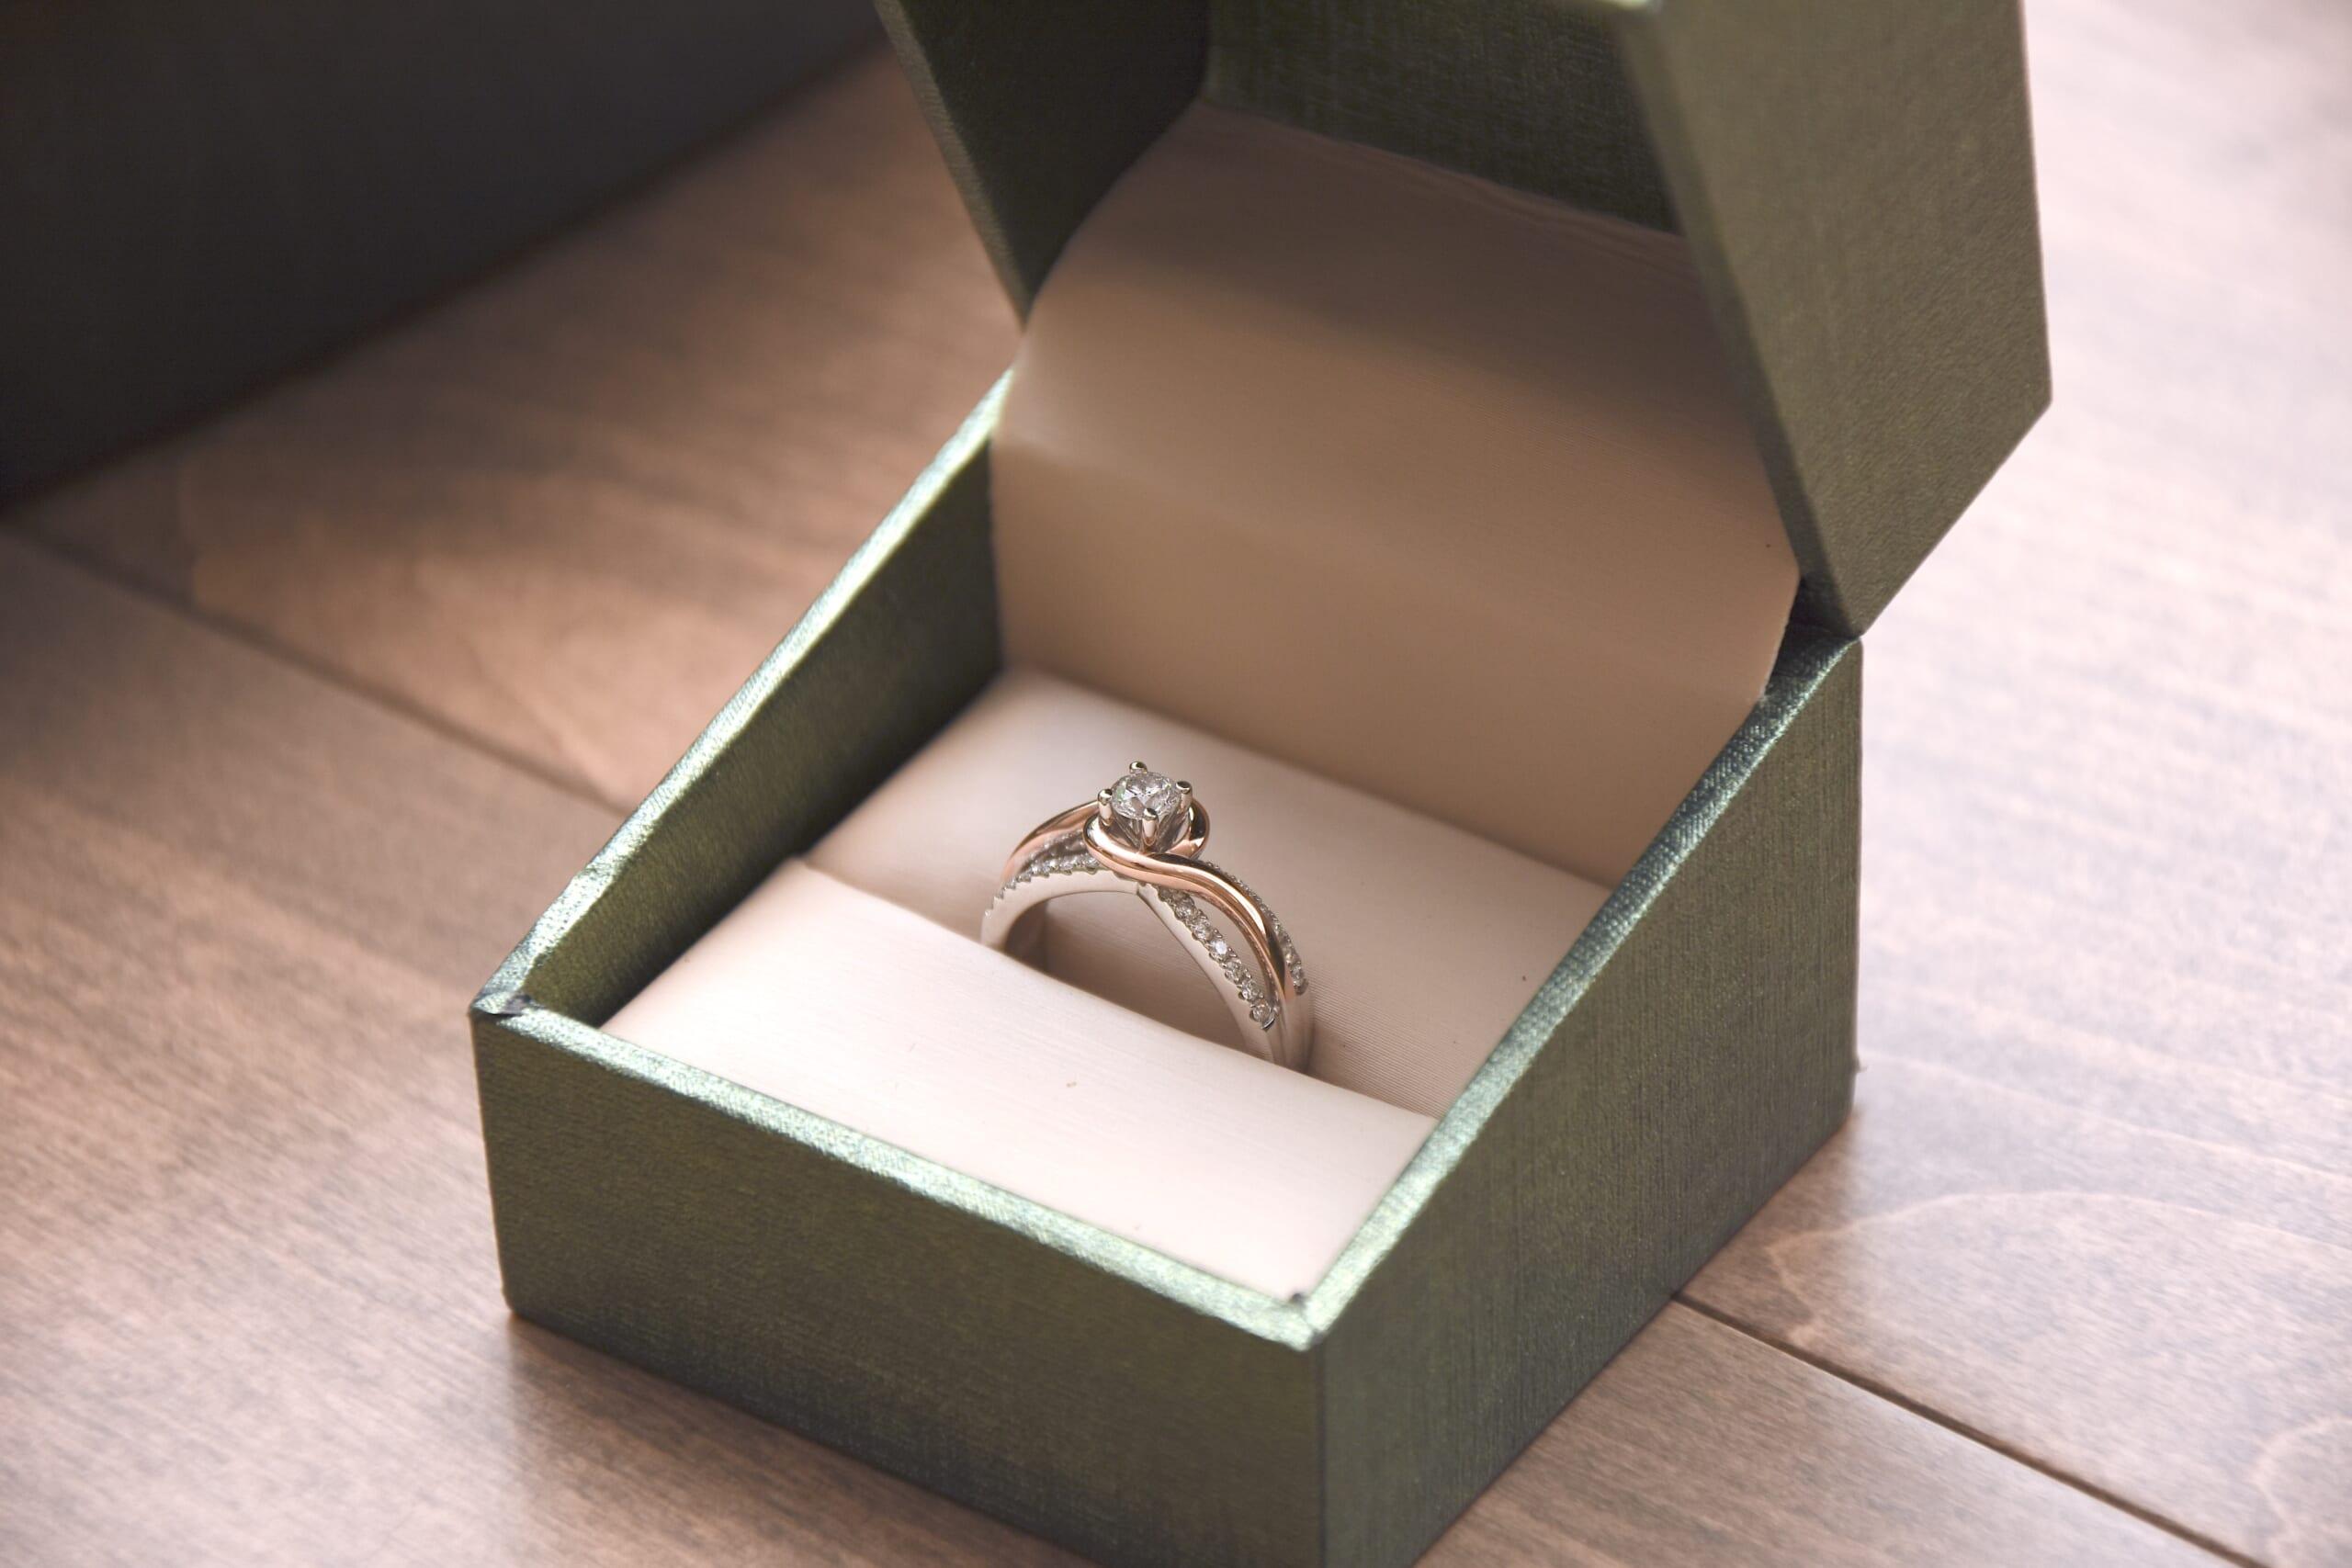 diamond ring 20 year anniversary ring for wife, wedding ring set, anniversary gift